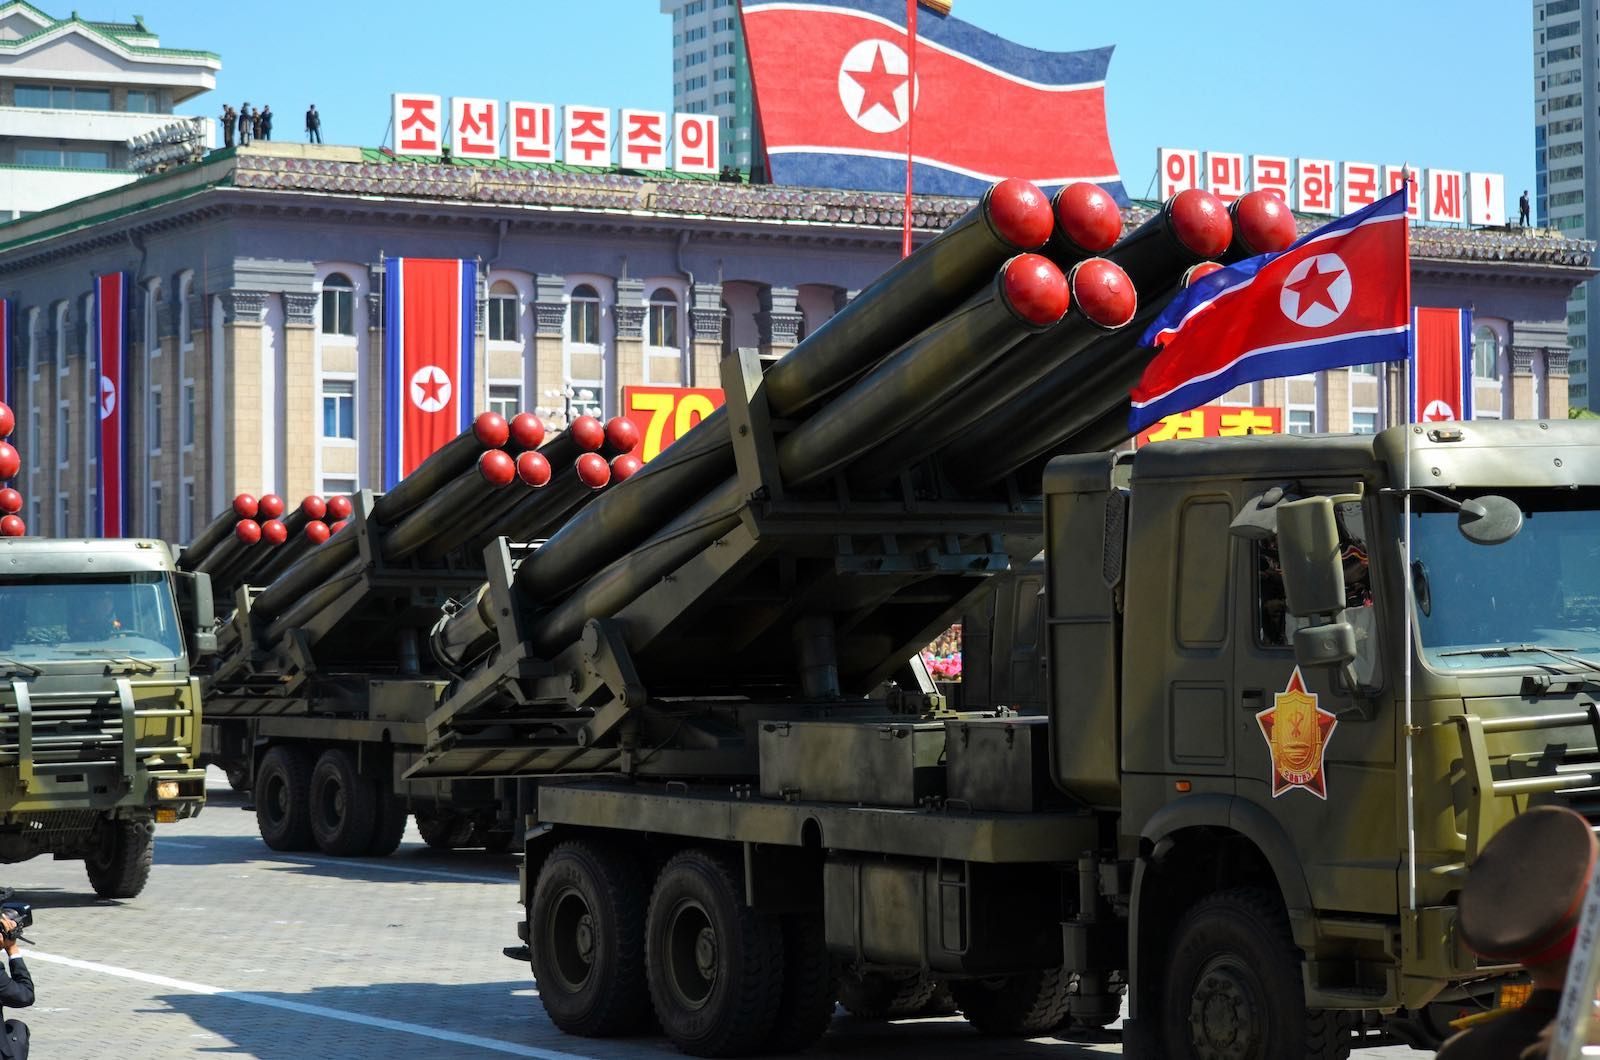 A military parade in North Korea in September 2018 (Photo: The Asahi Shimbun via Getty)